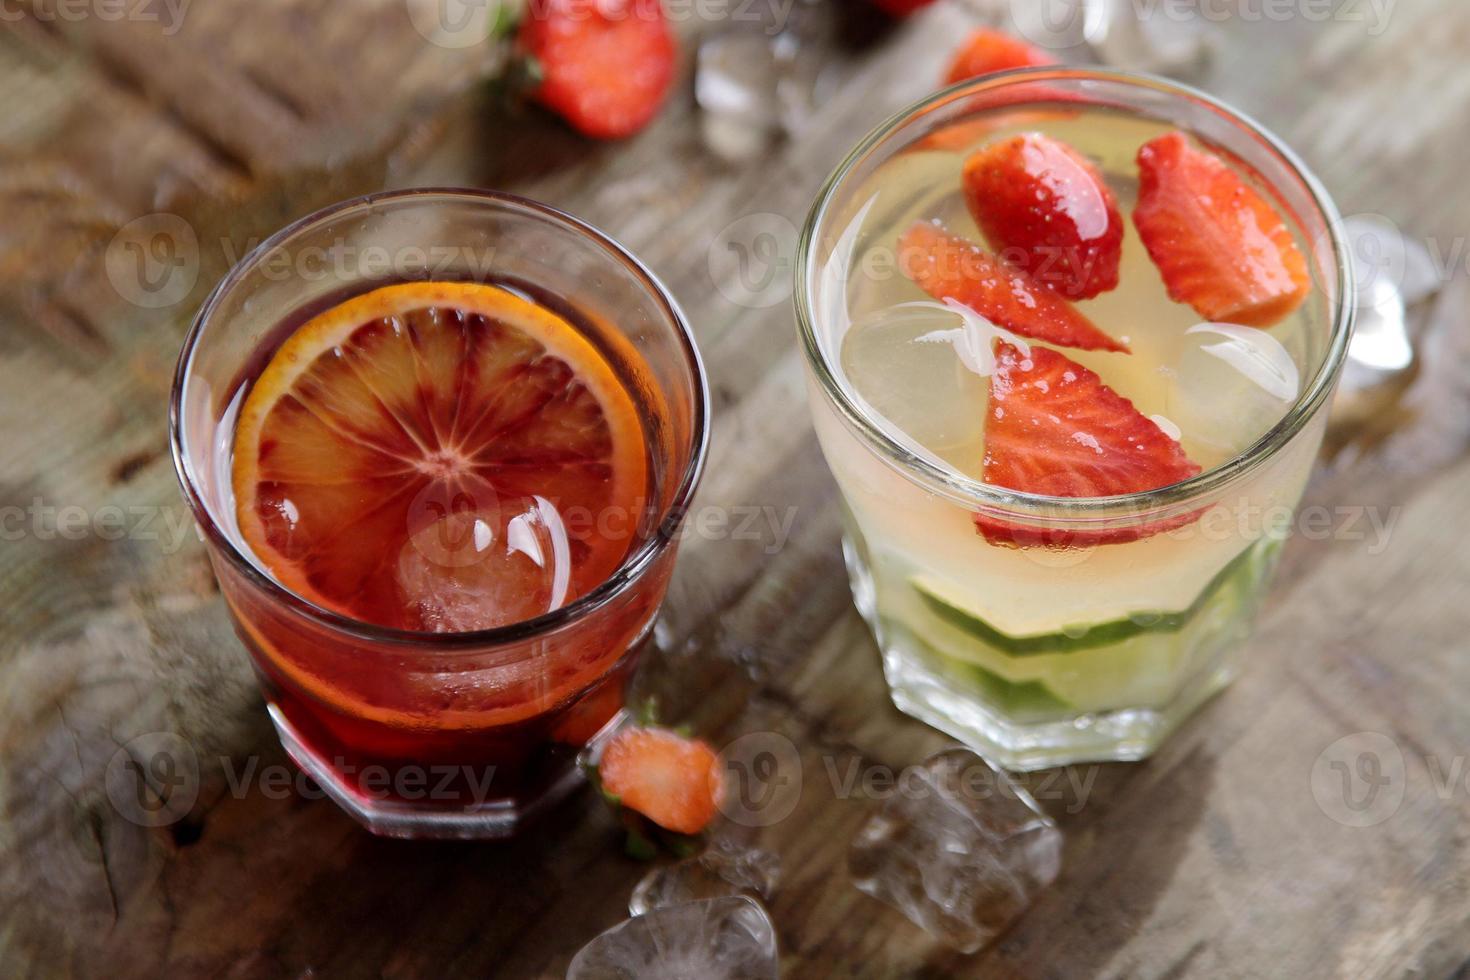 anderer frischer Cocktail foto